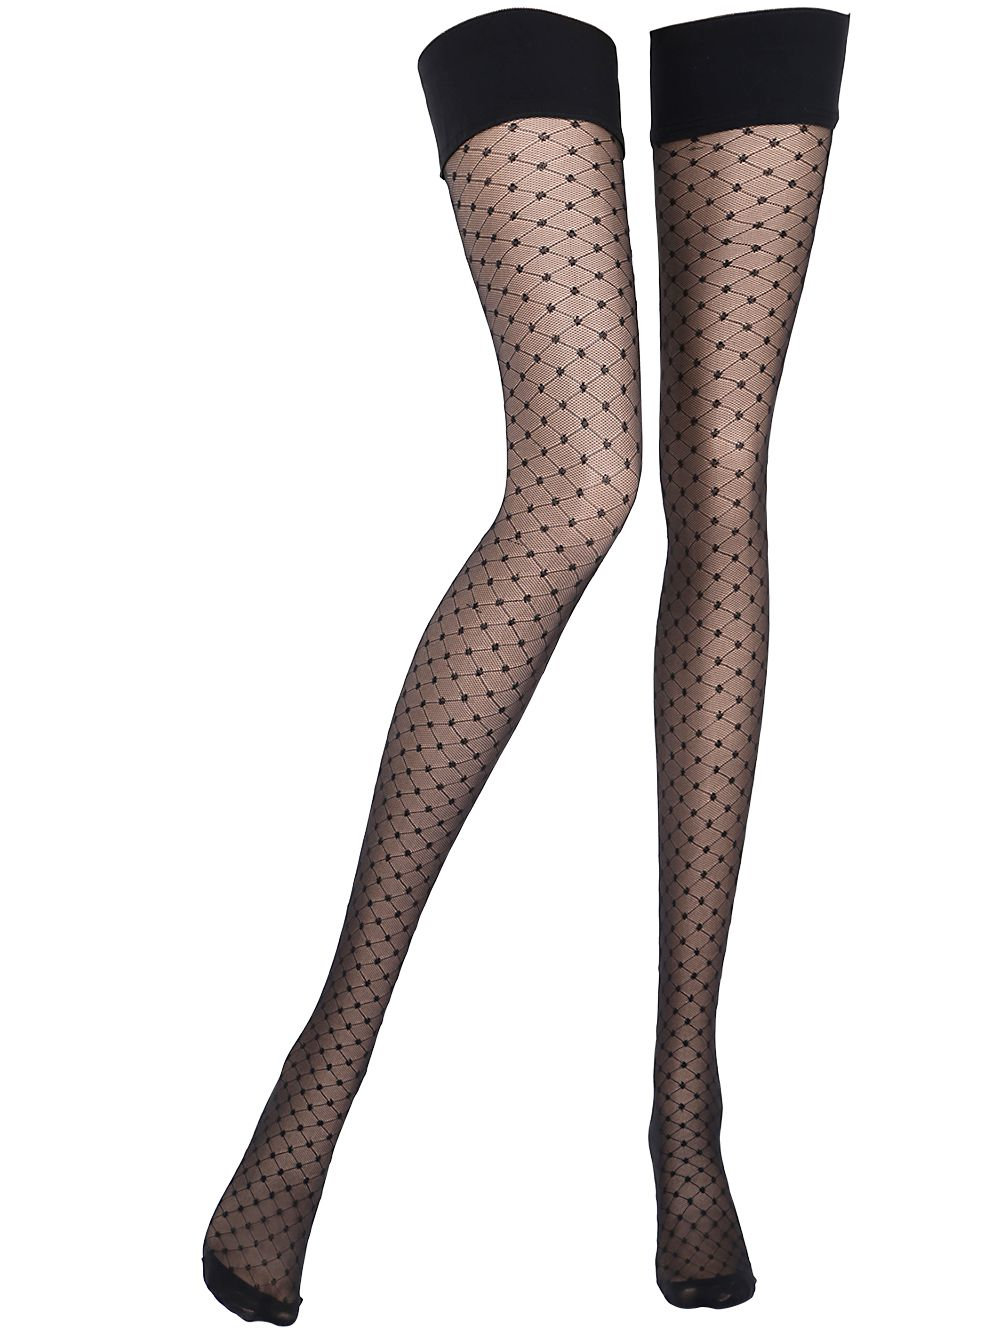 a9b13003b Chantal Thomass Bandana Polka Dot Thigh High Stockings in Black - Lyst